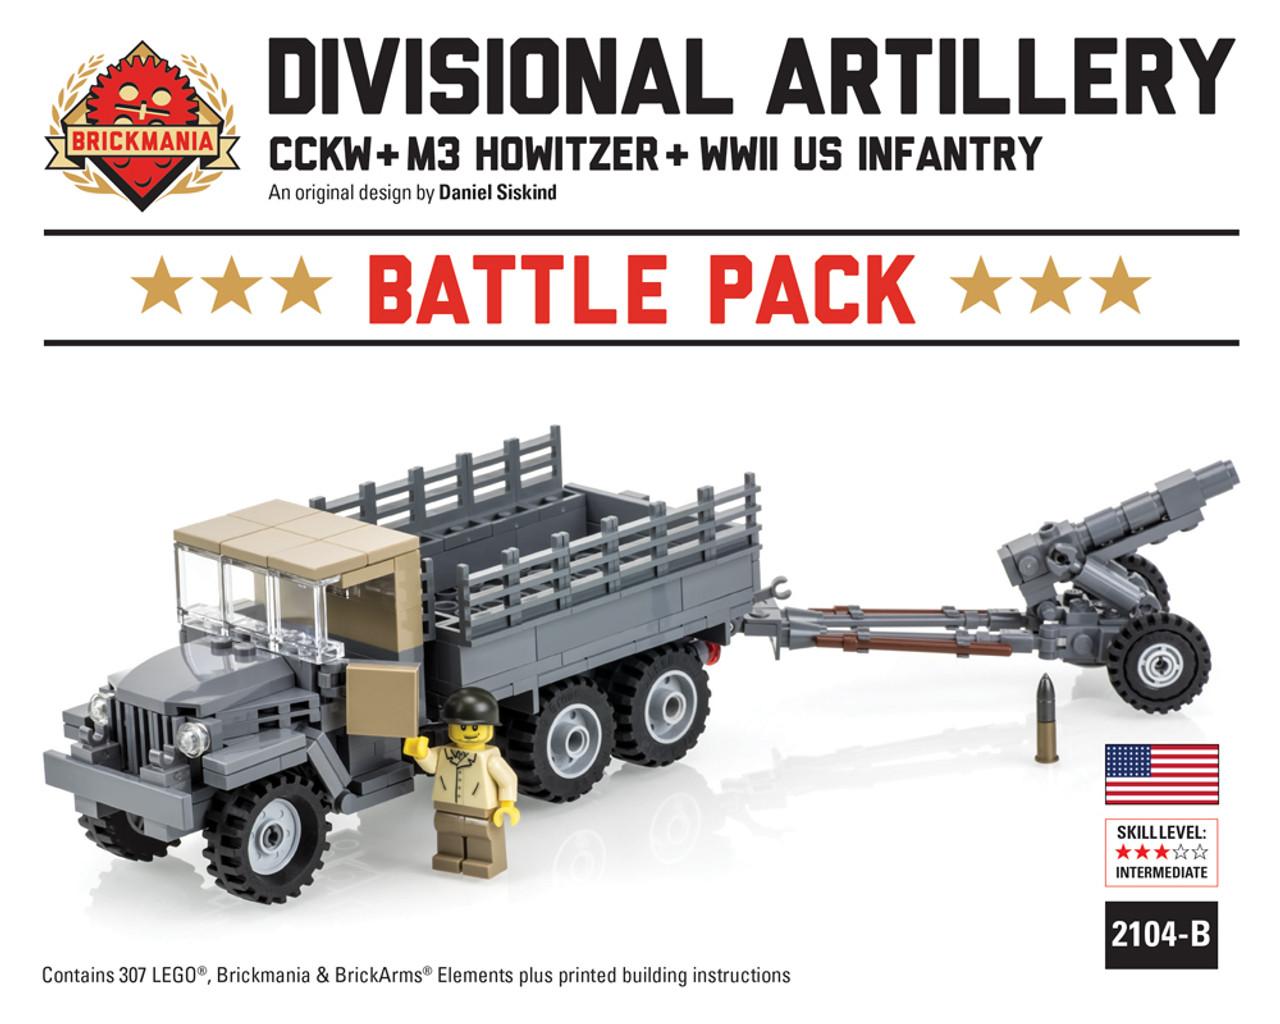 Divisional Artillery Battle Pack